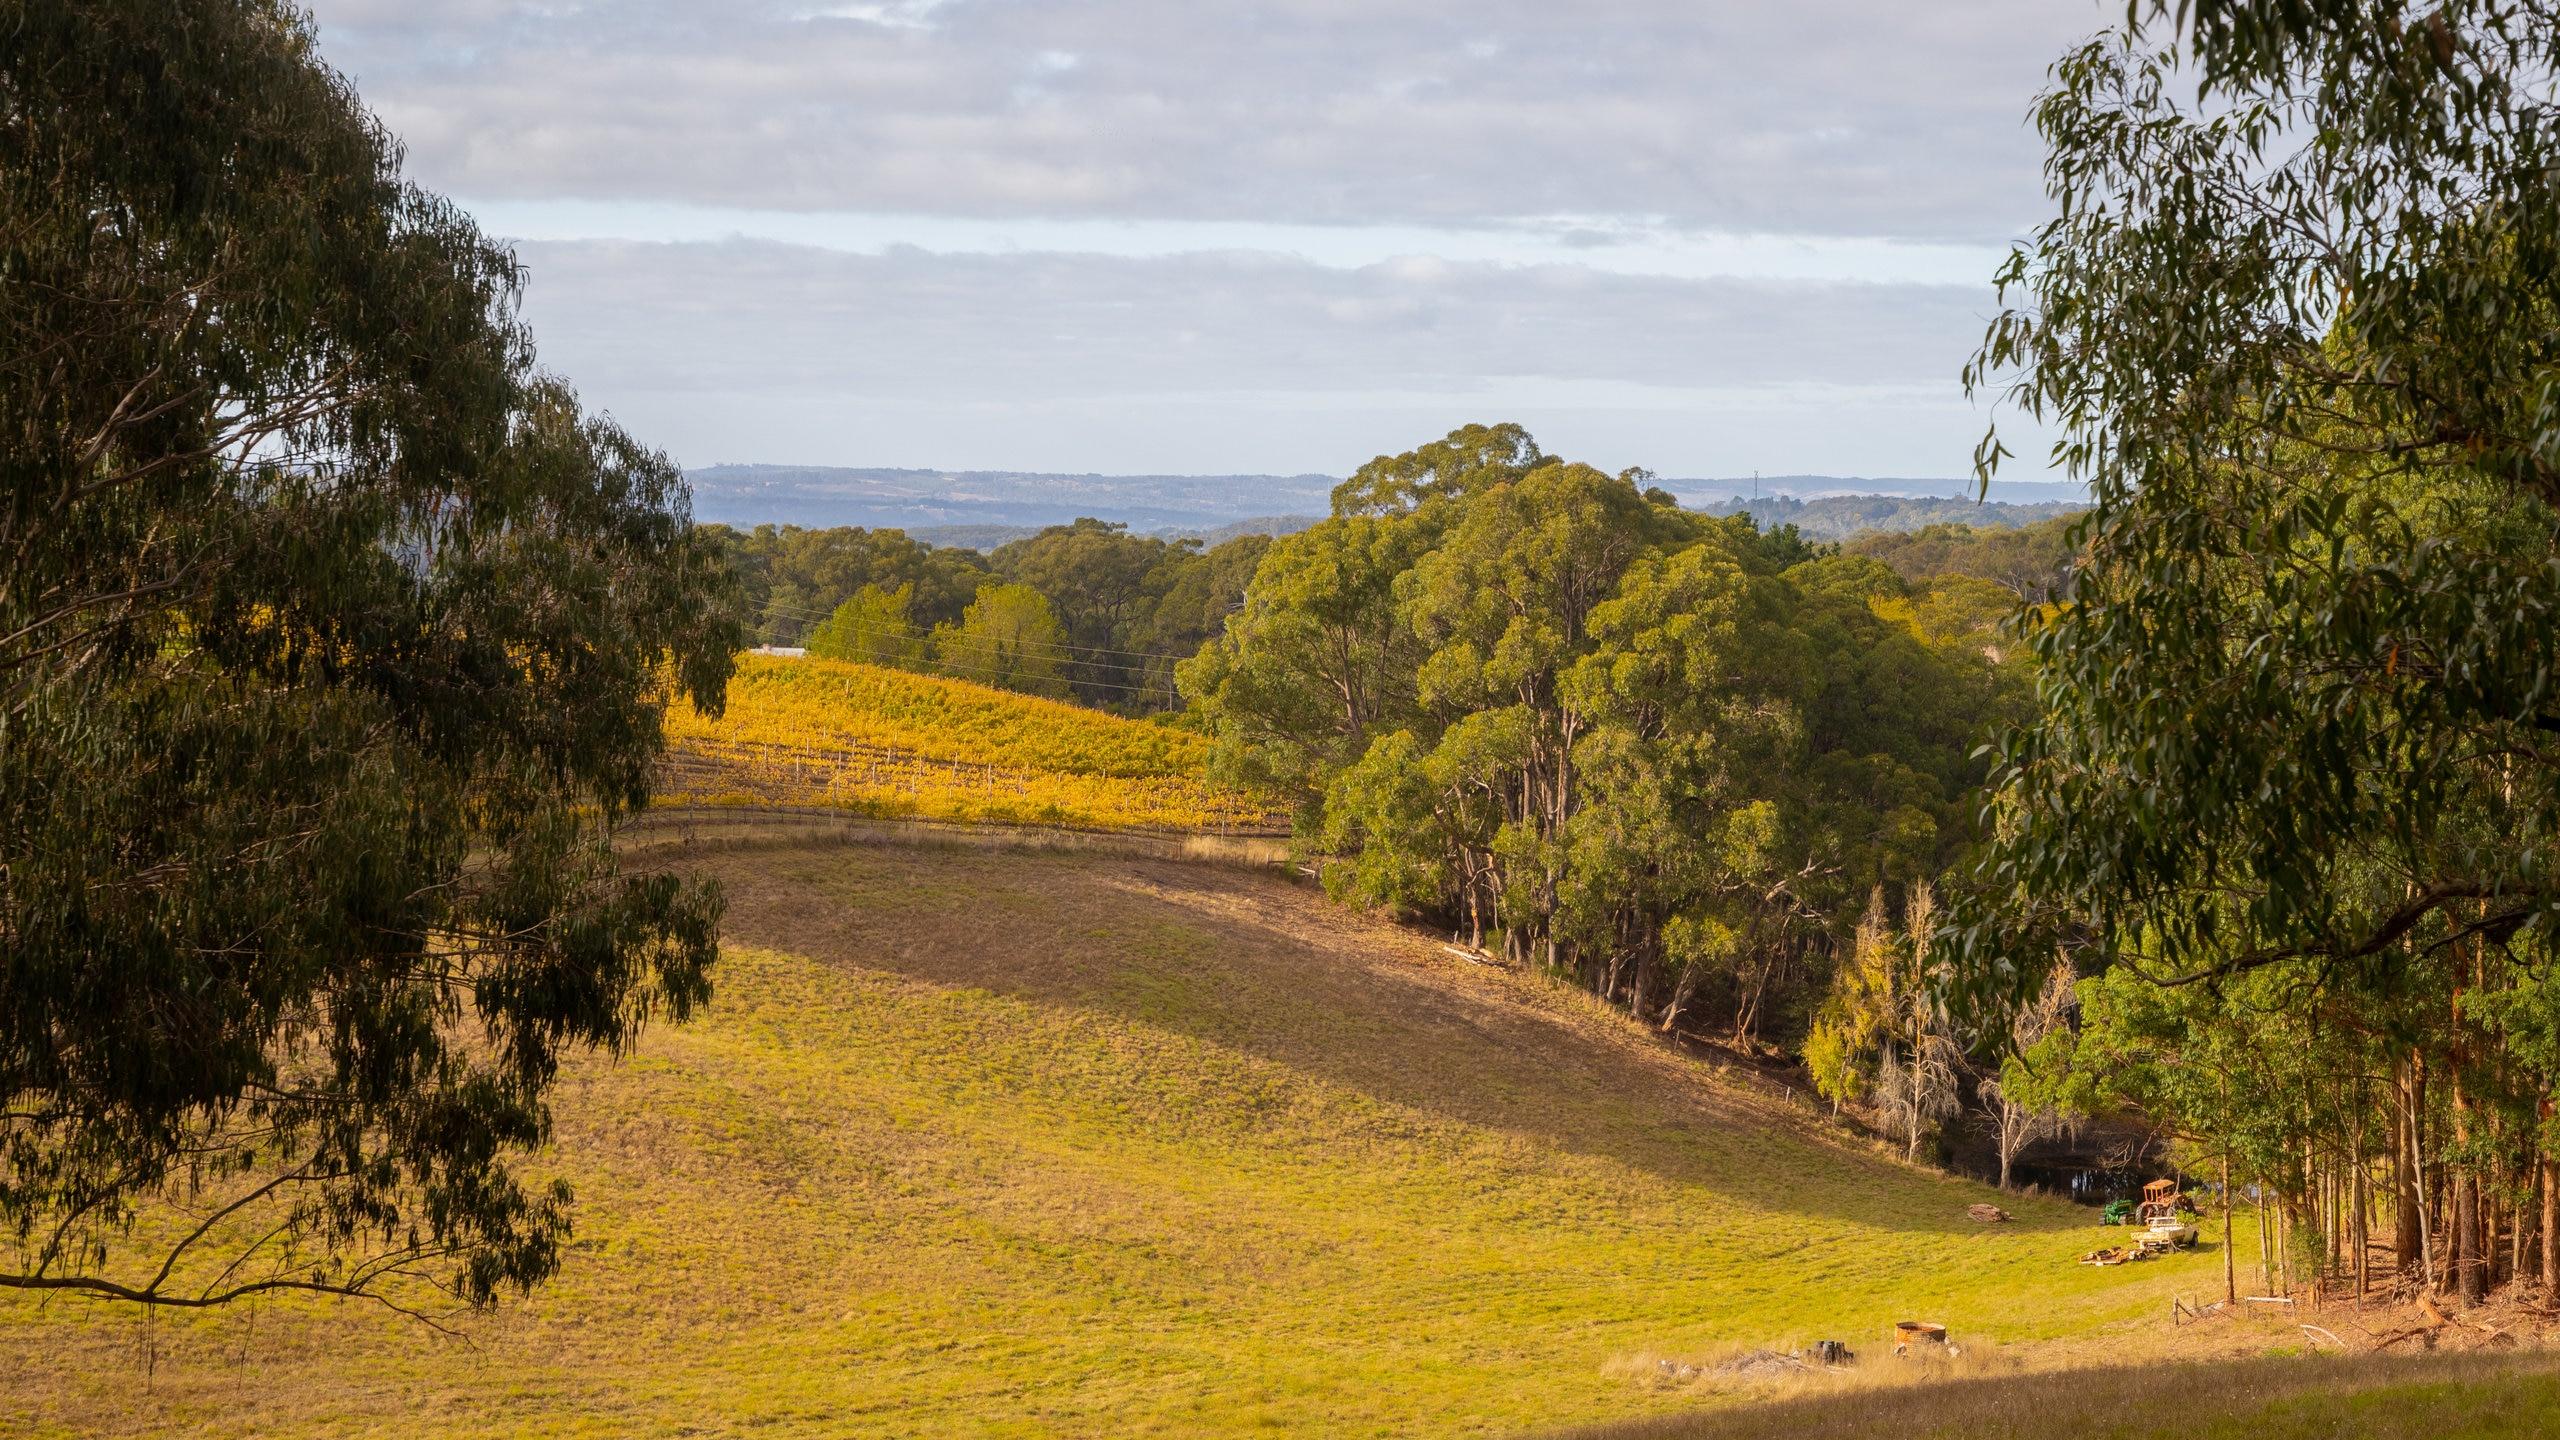 Crafers, Adelaide, South Australia, Australia